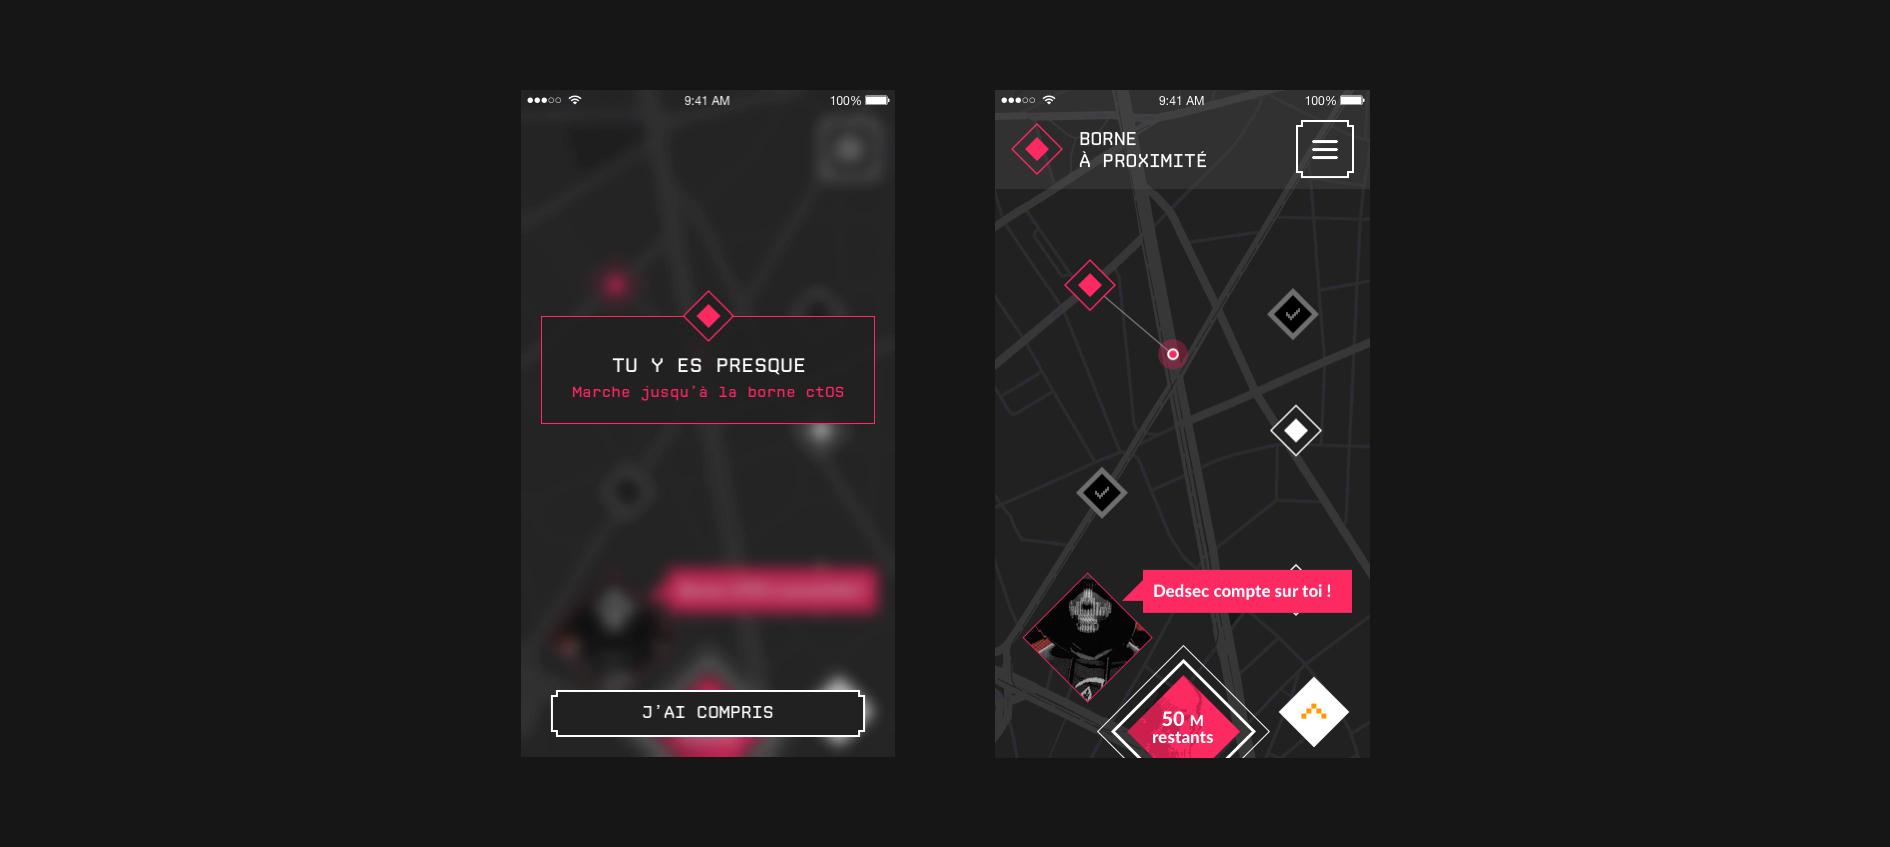 new-planche-app-6